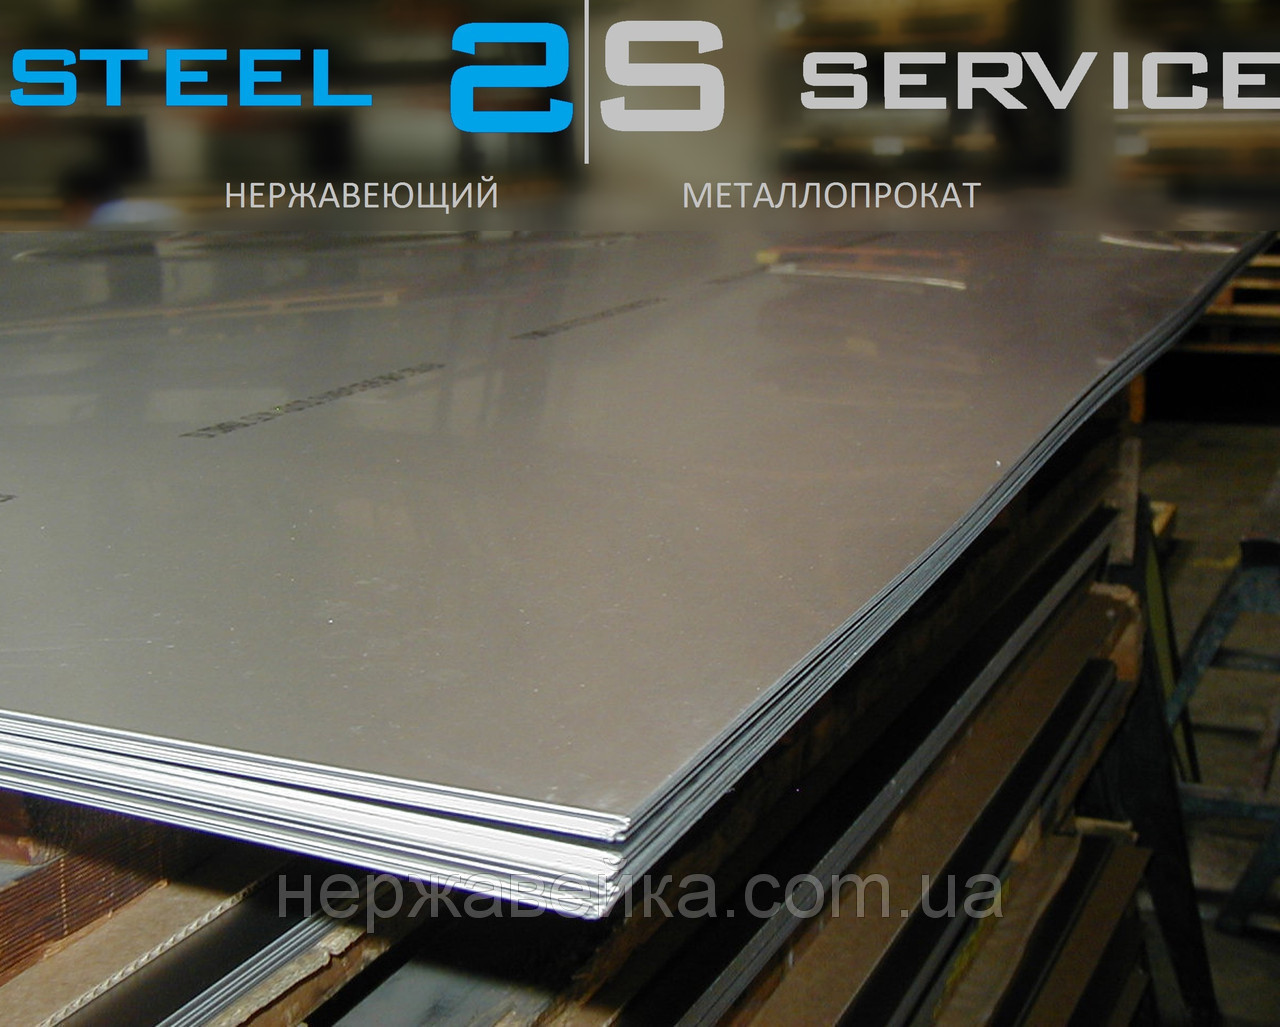 Нержавеющий лист 14х1000х2000мм  AISI 316L(03Х17Н14М3) F1 - горячекатанный,  кислотостойкий